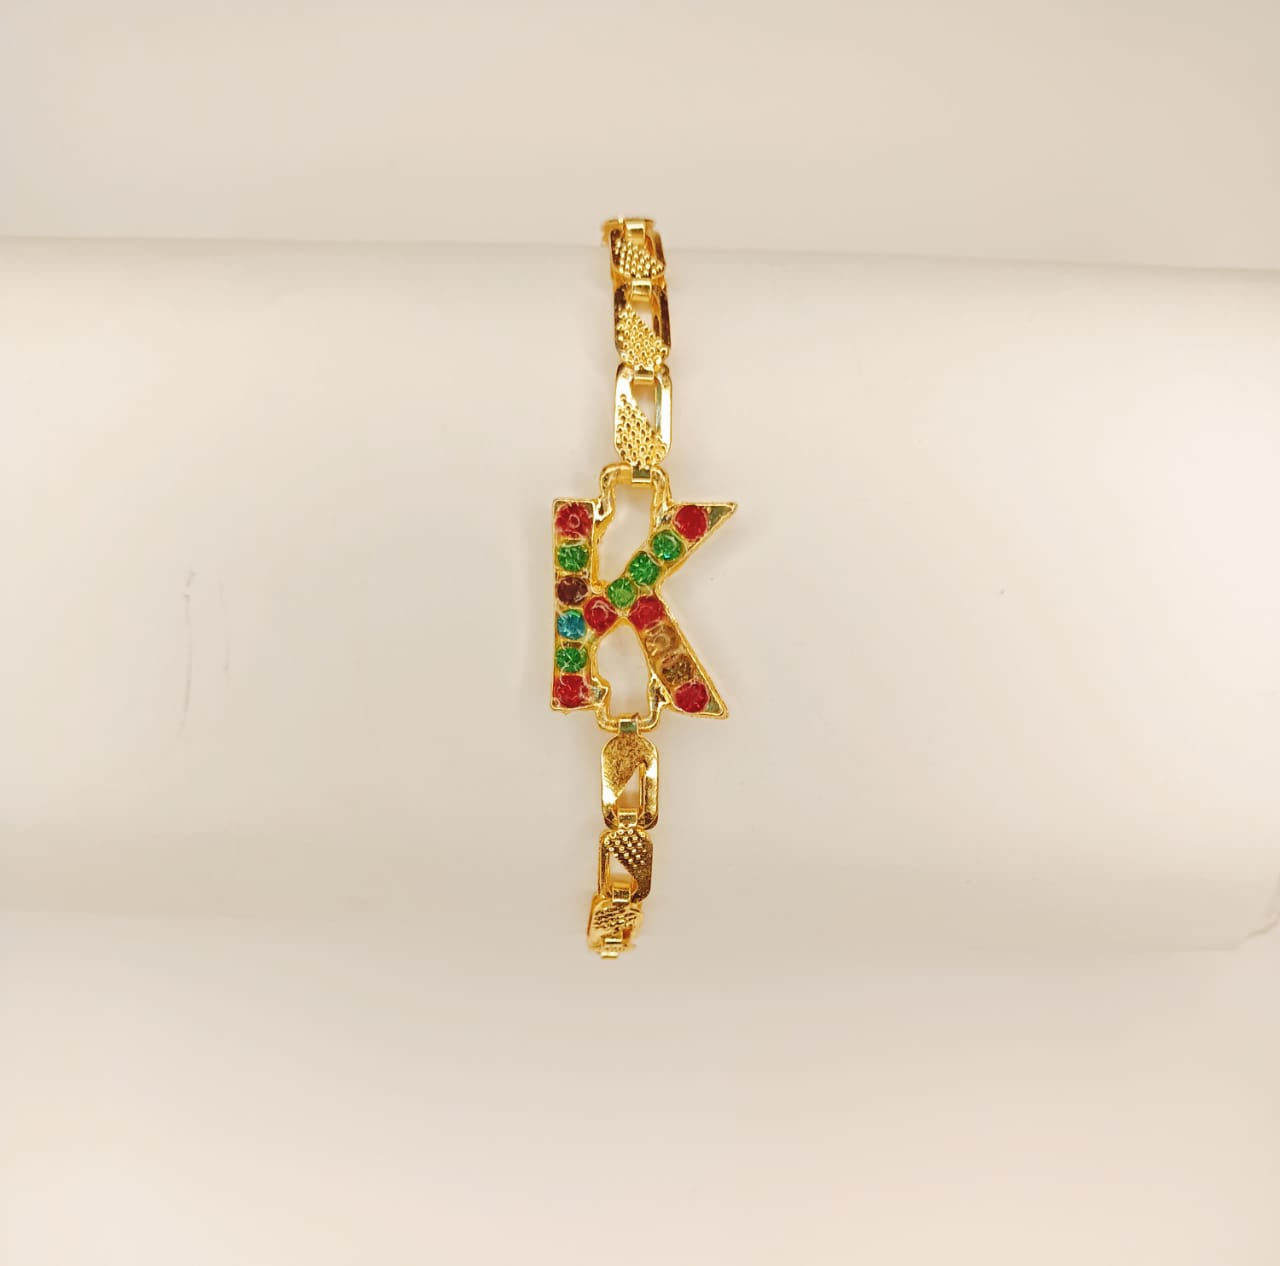 Stylish Gold Alloy K Zircon Bracelet For Girls, Women